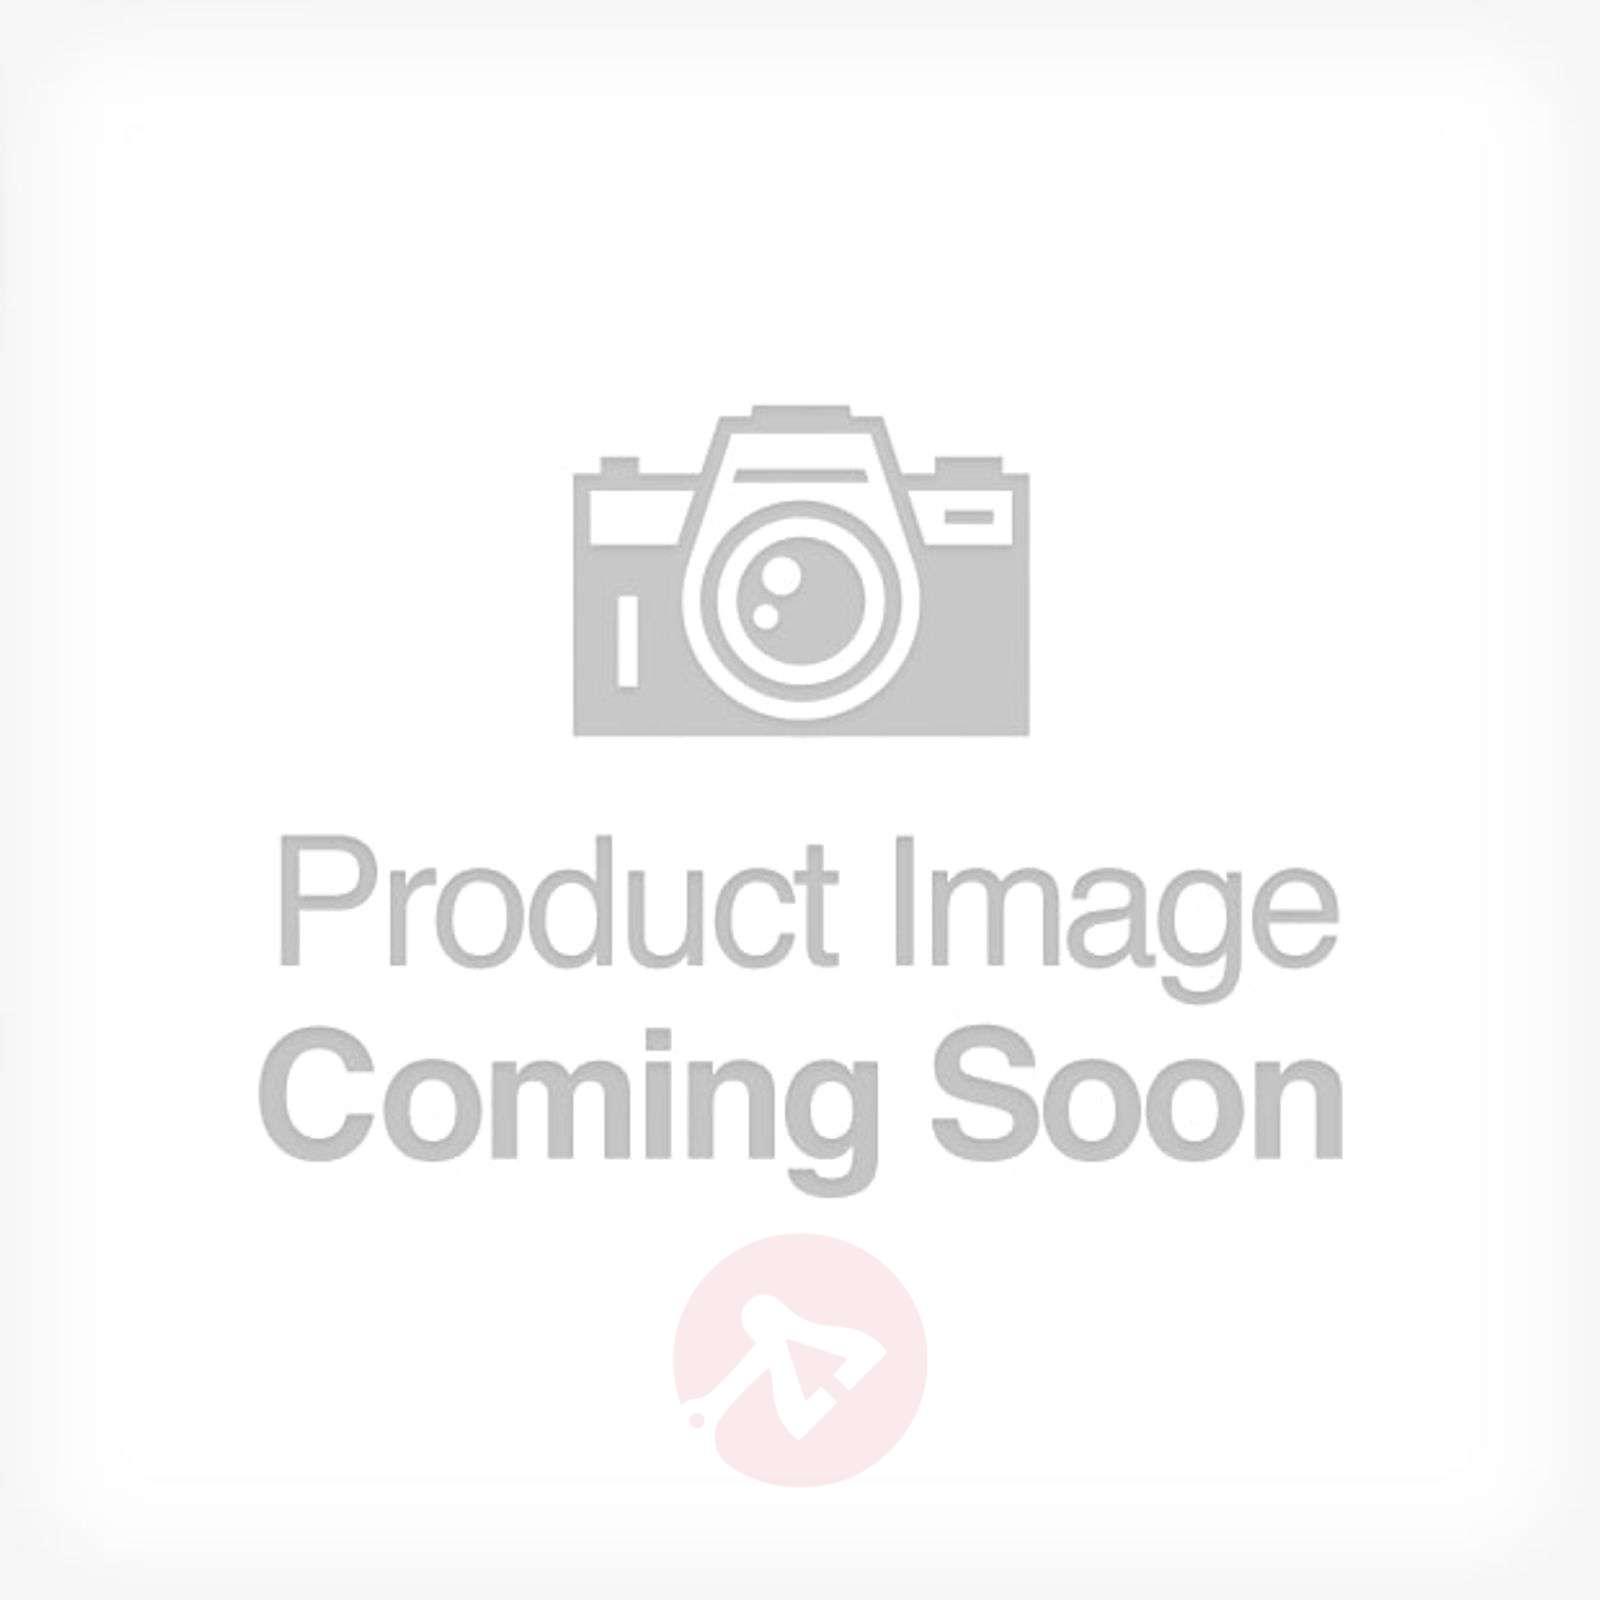 Beautiful outdoor wall light MEMI-1002238X-01